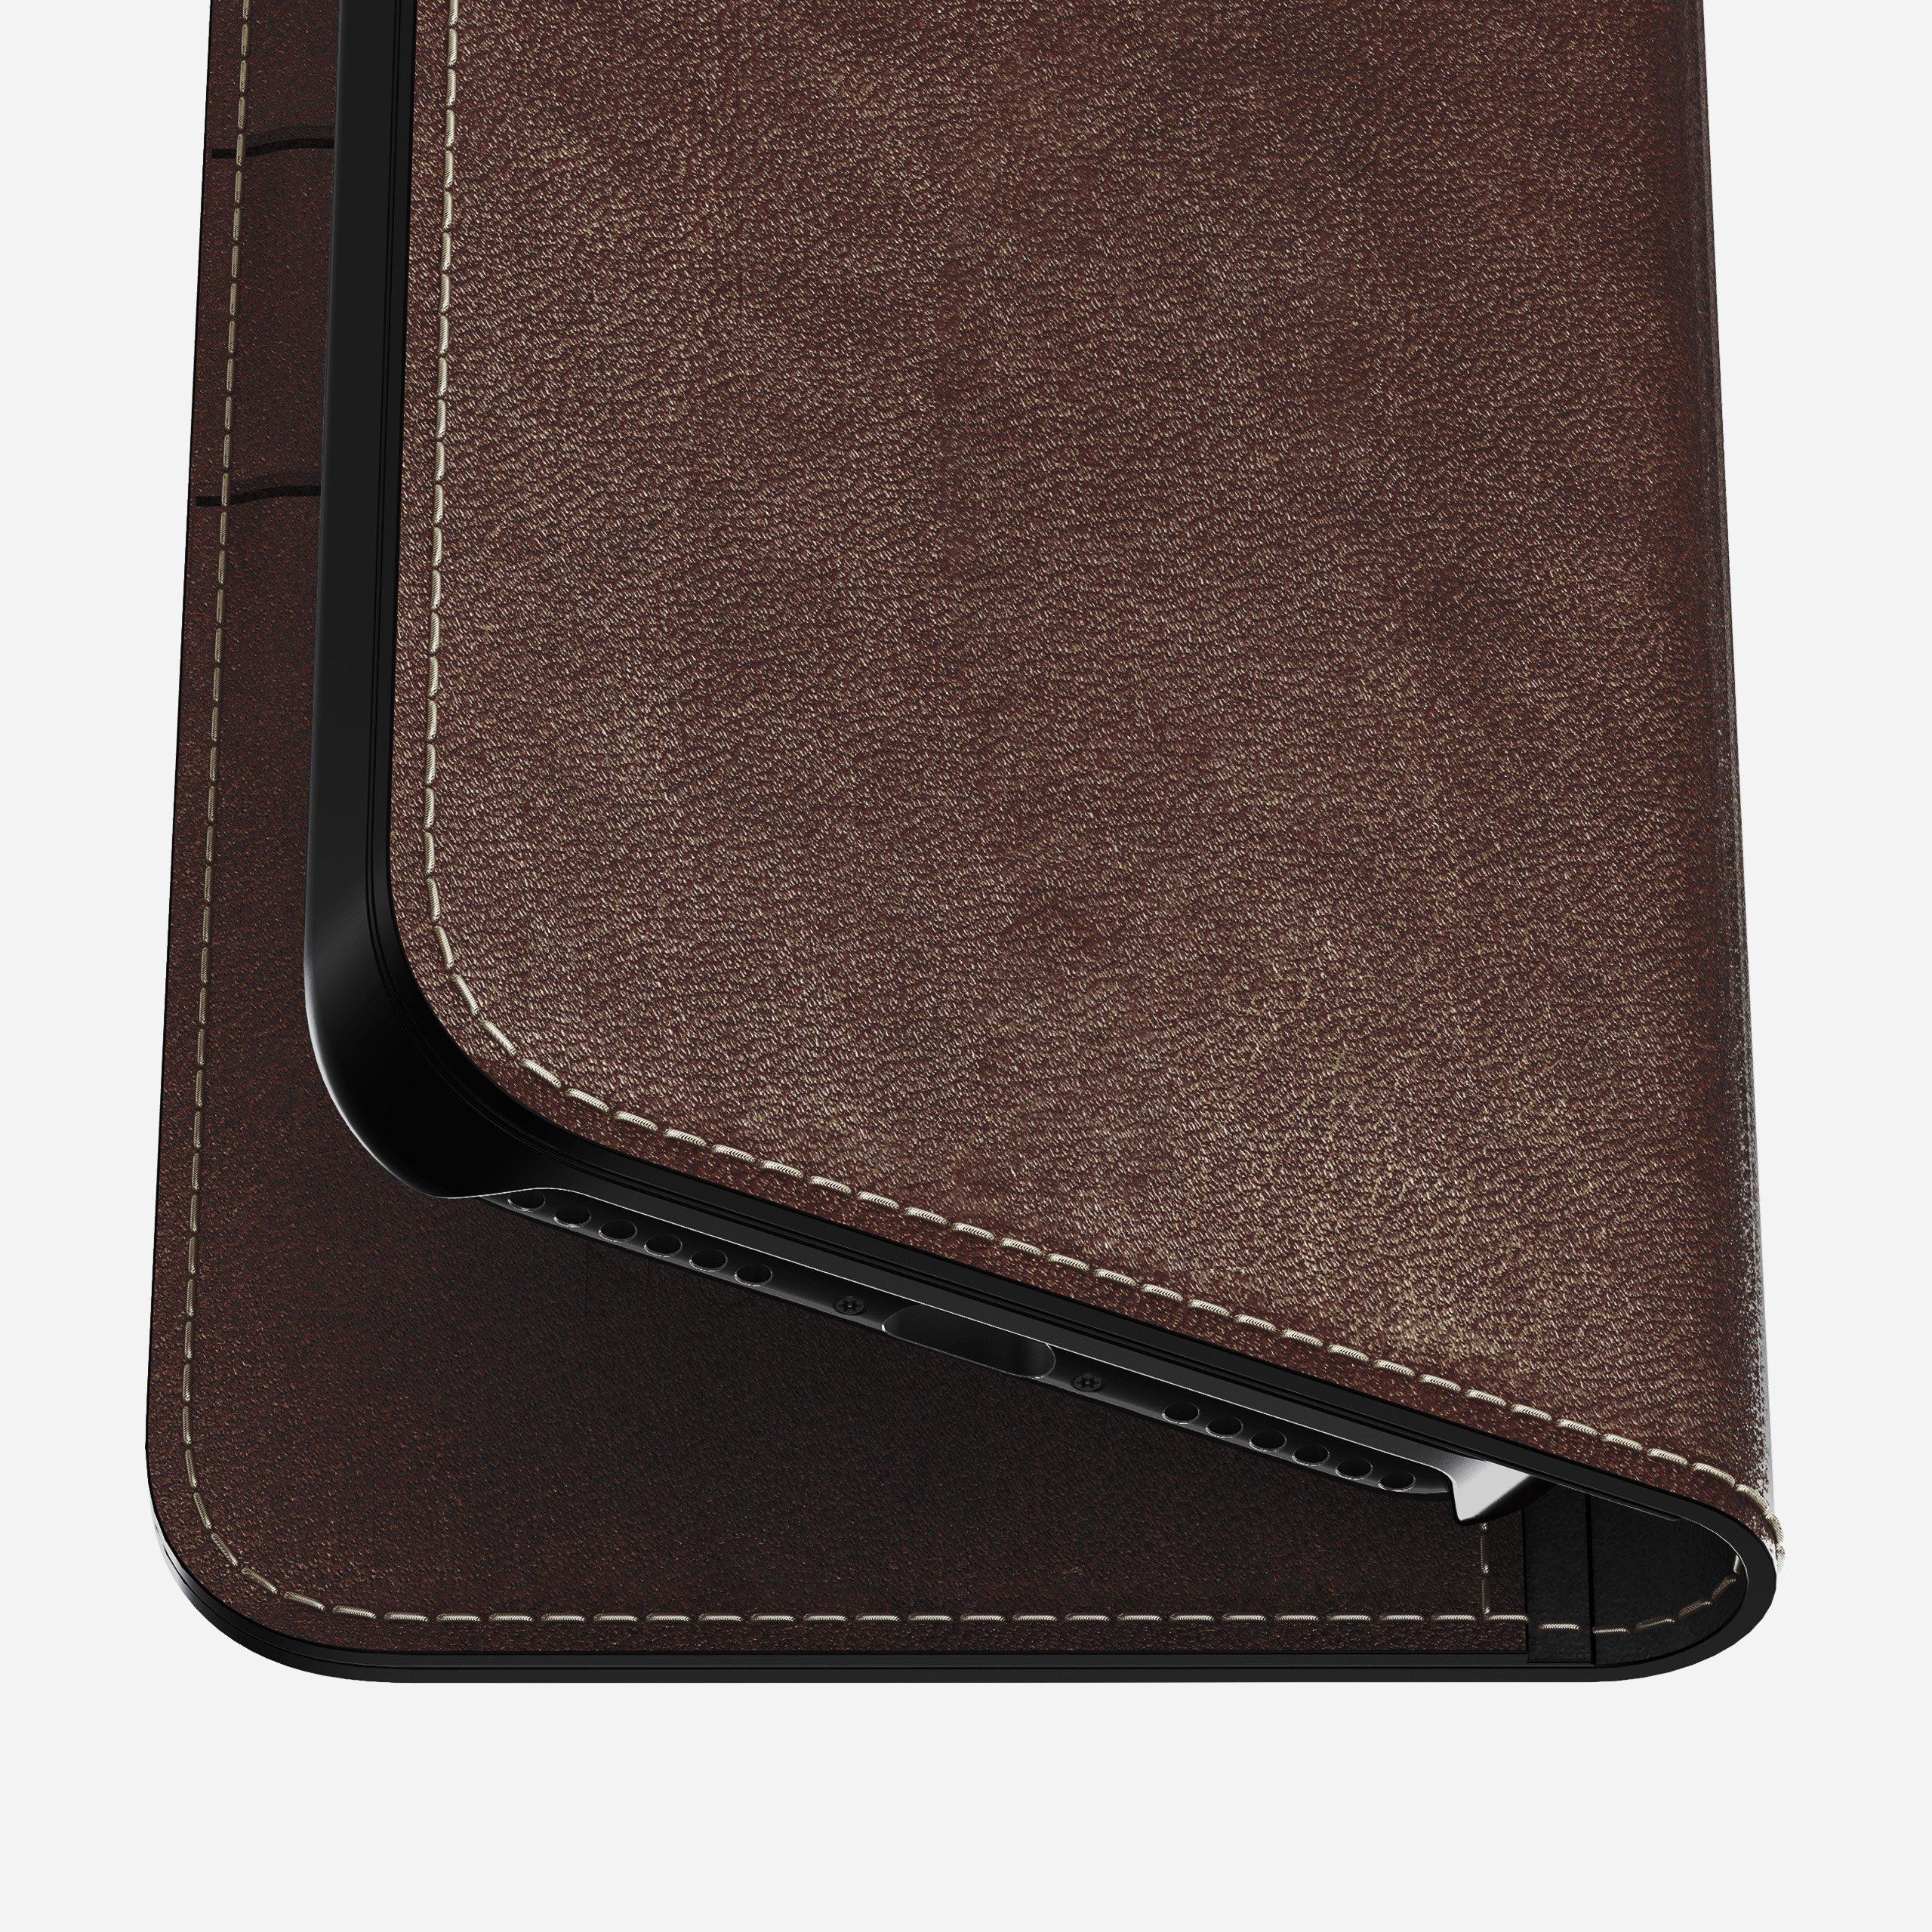 Leather folio rustic brown x